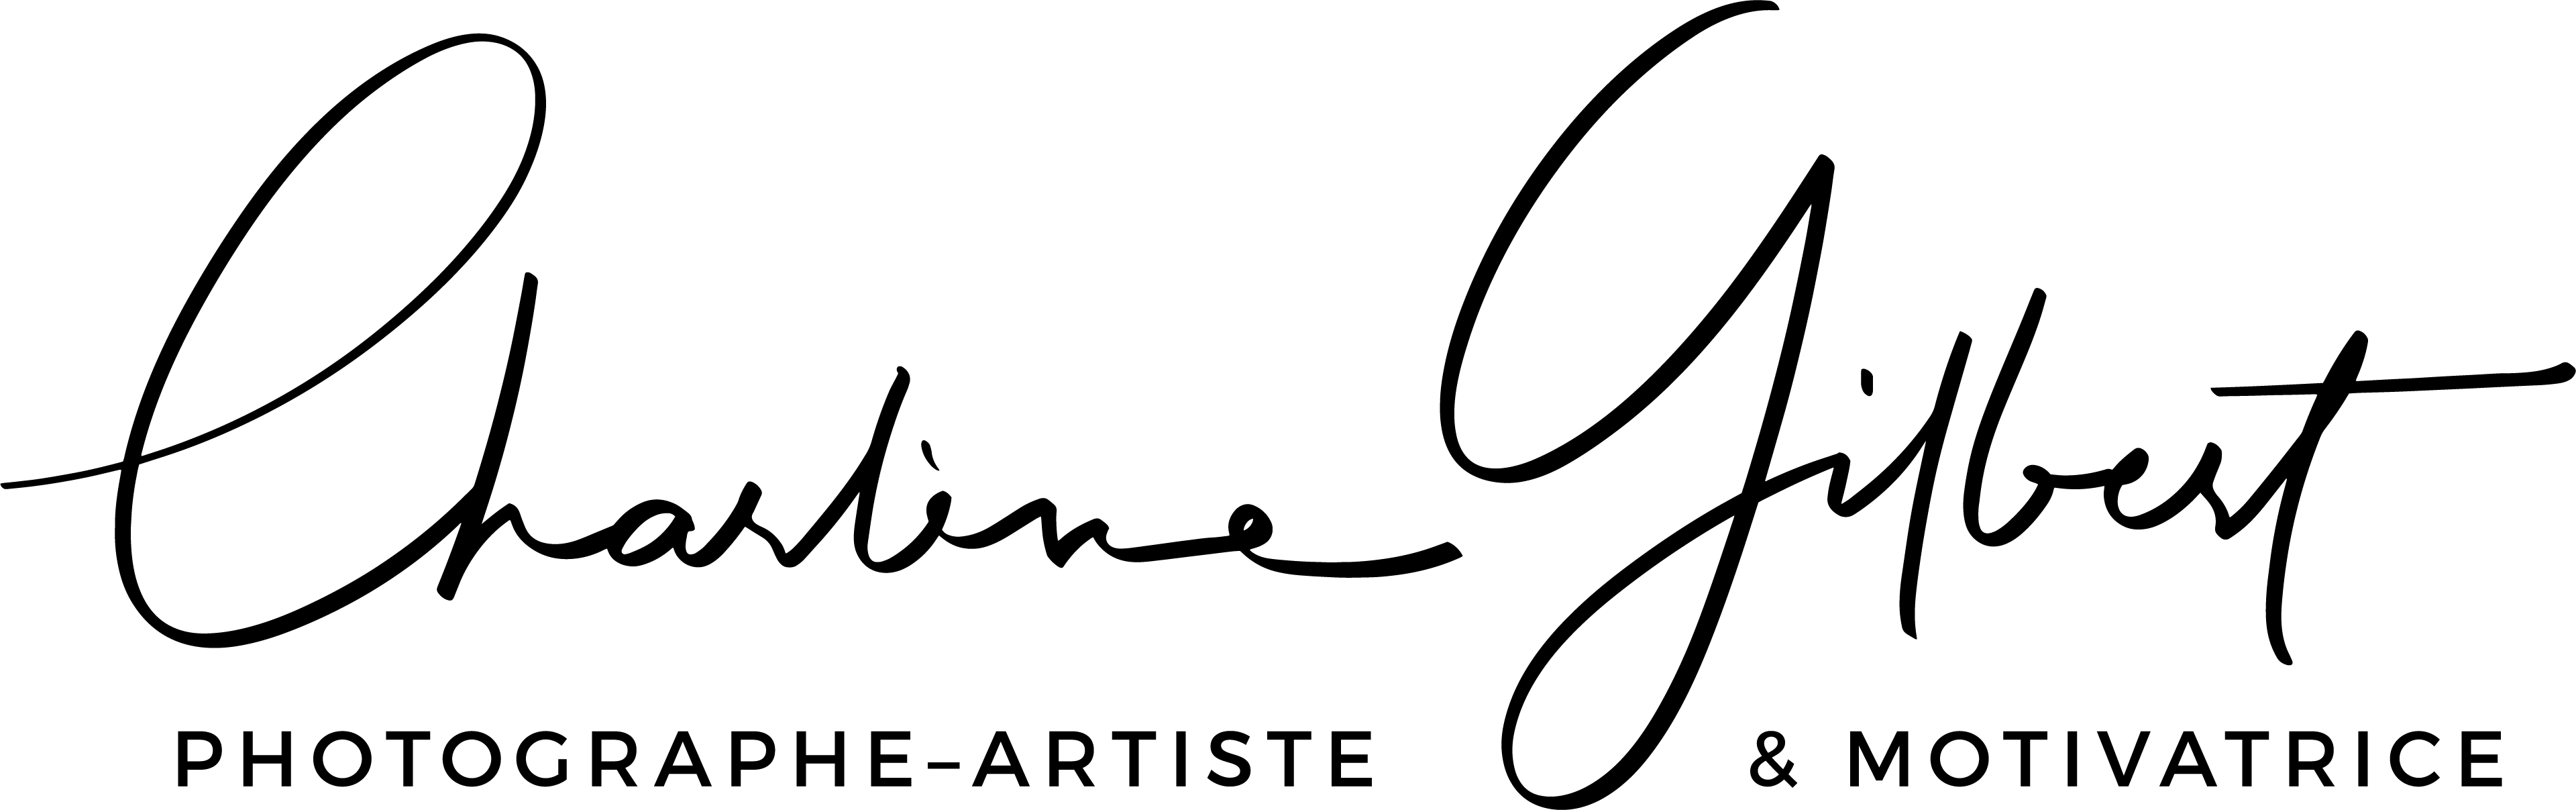 Signature Logo2019 Complet